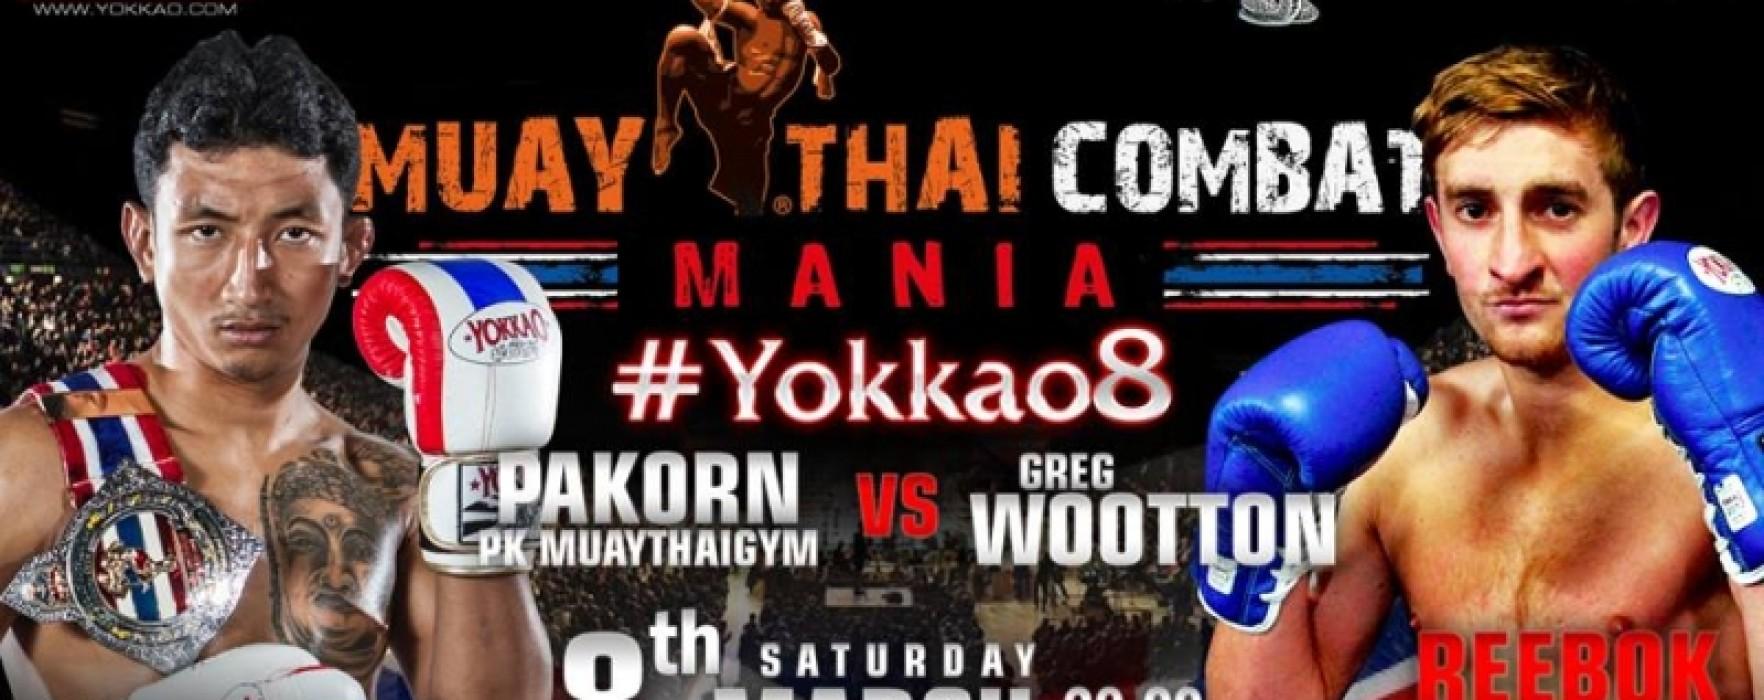 Yokkao 8 in Manchester featuring Pakorn vs Greg Wootton